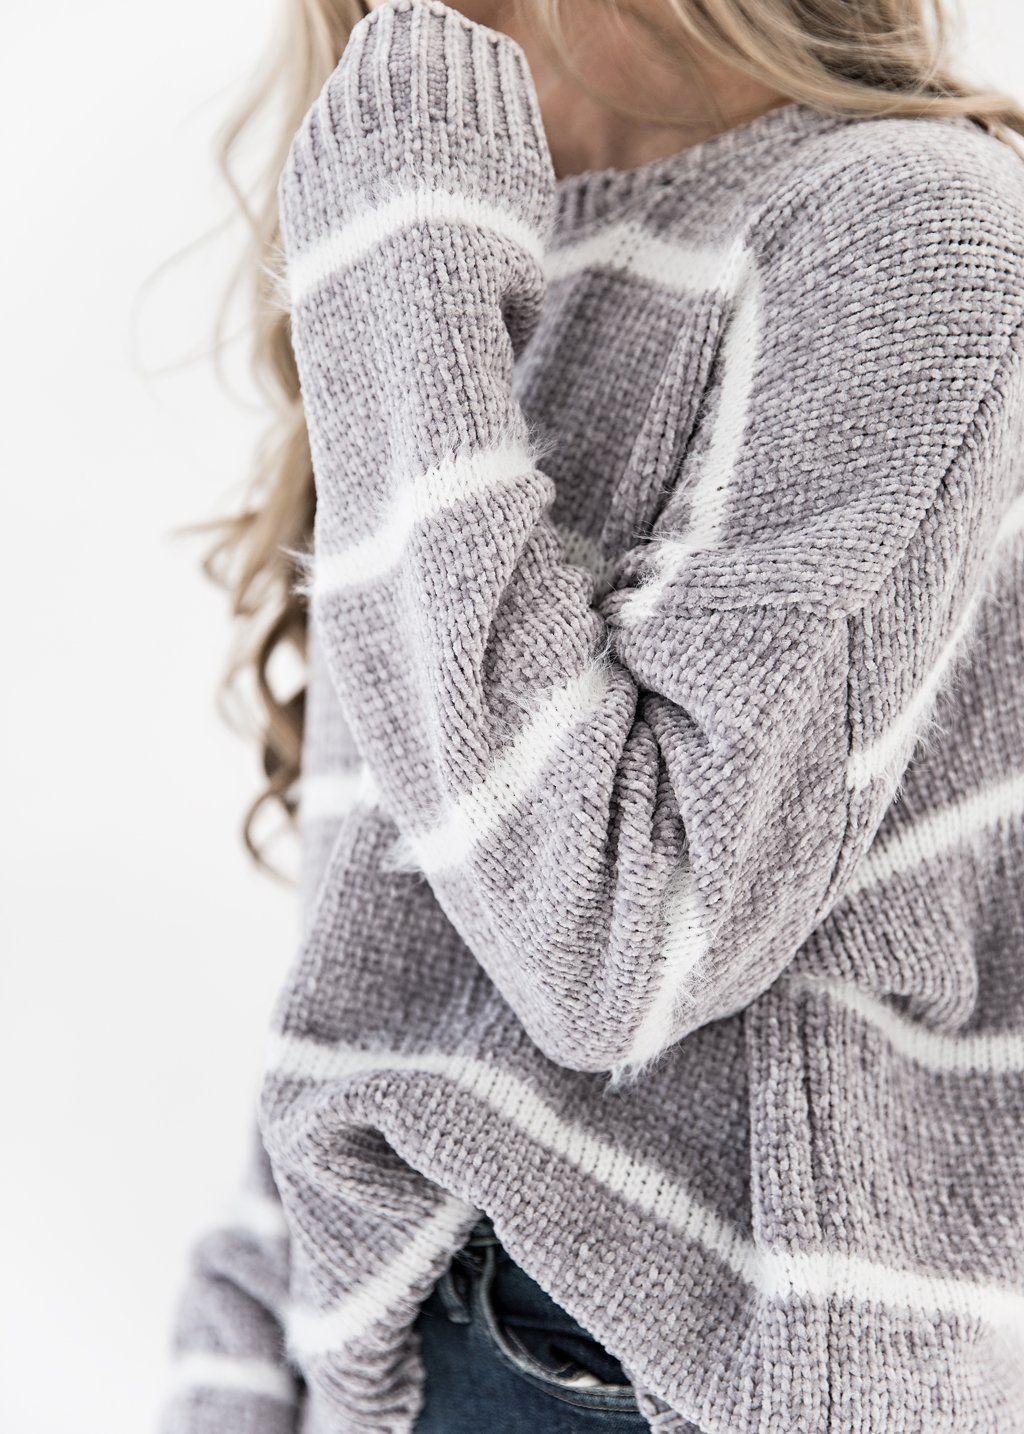 Light Grey Striped Crushed Sweater, JessaKae, New Arrival, Light Grey, Striped, …